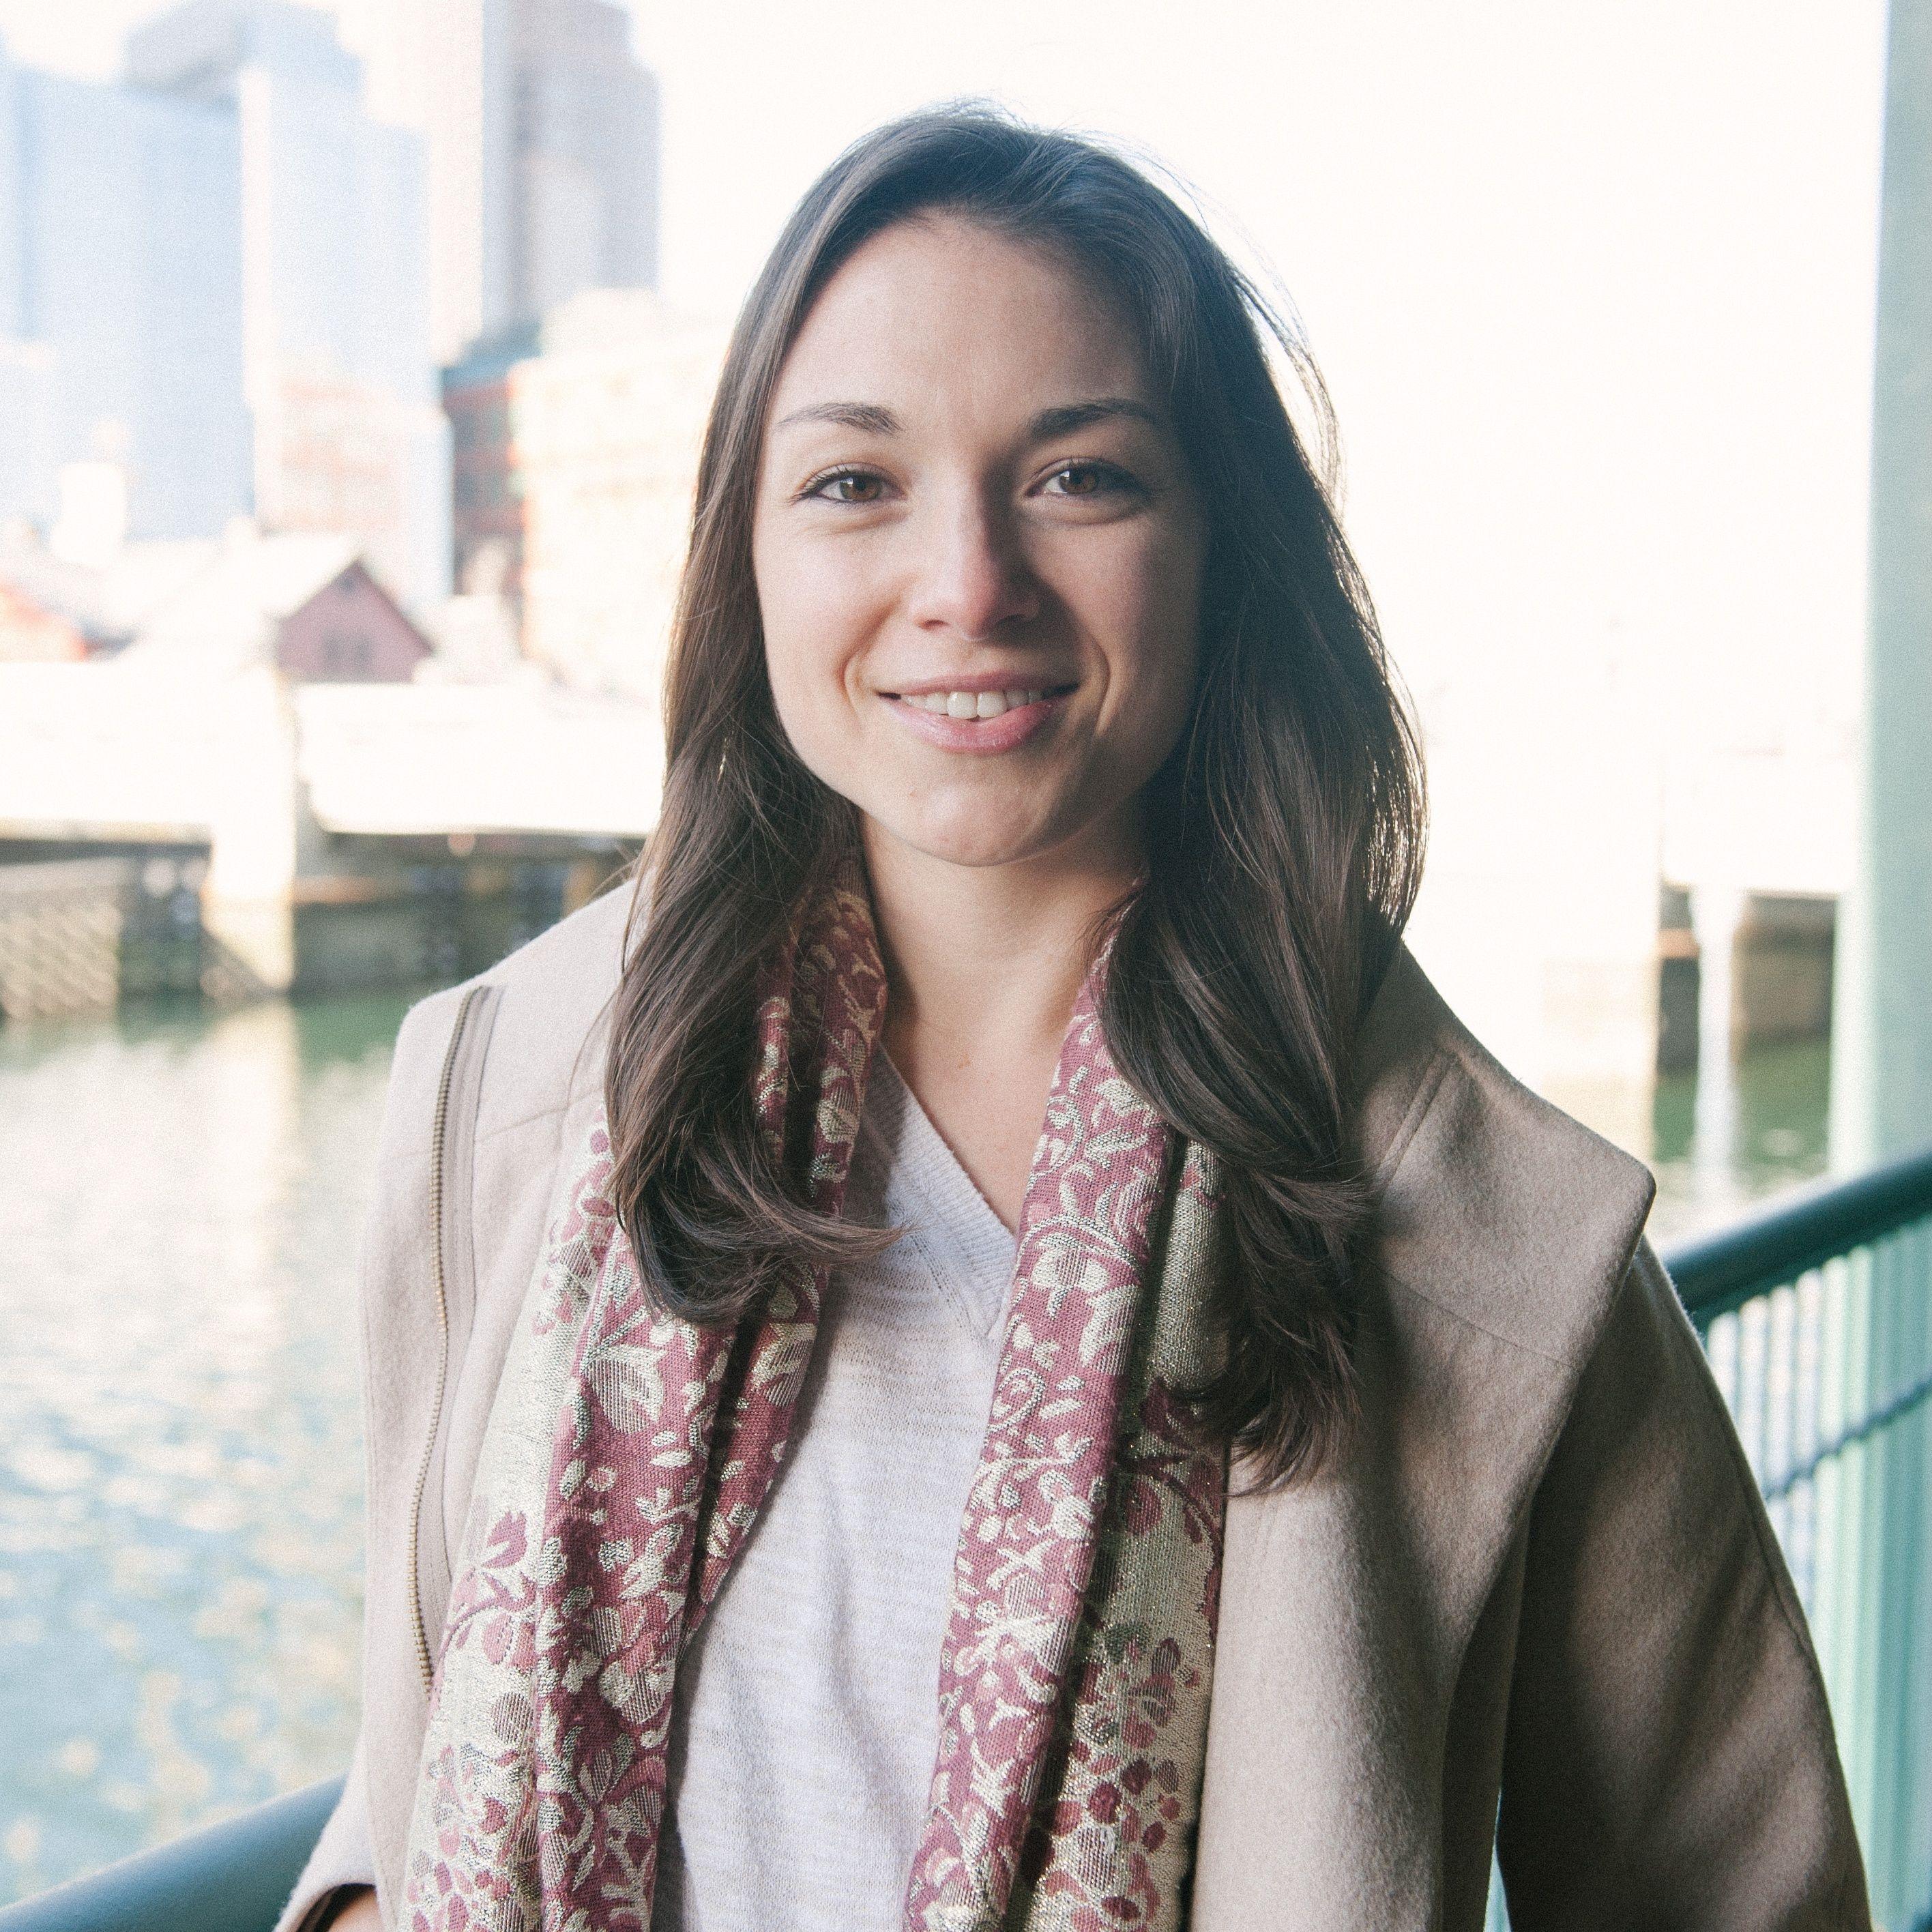 Emily McLaughlin